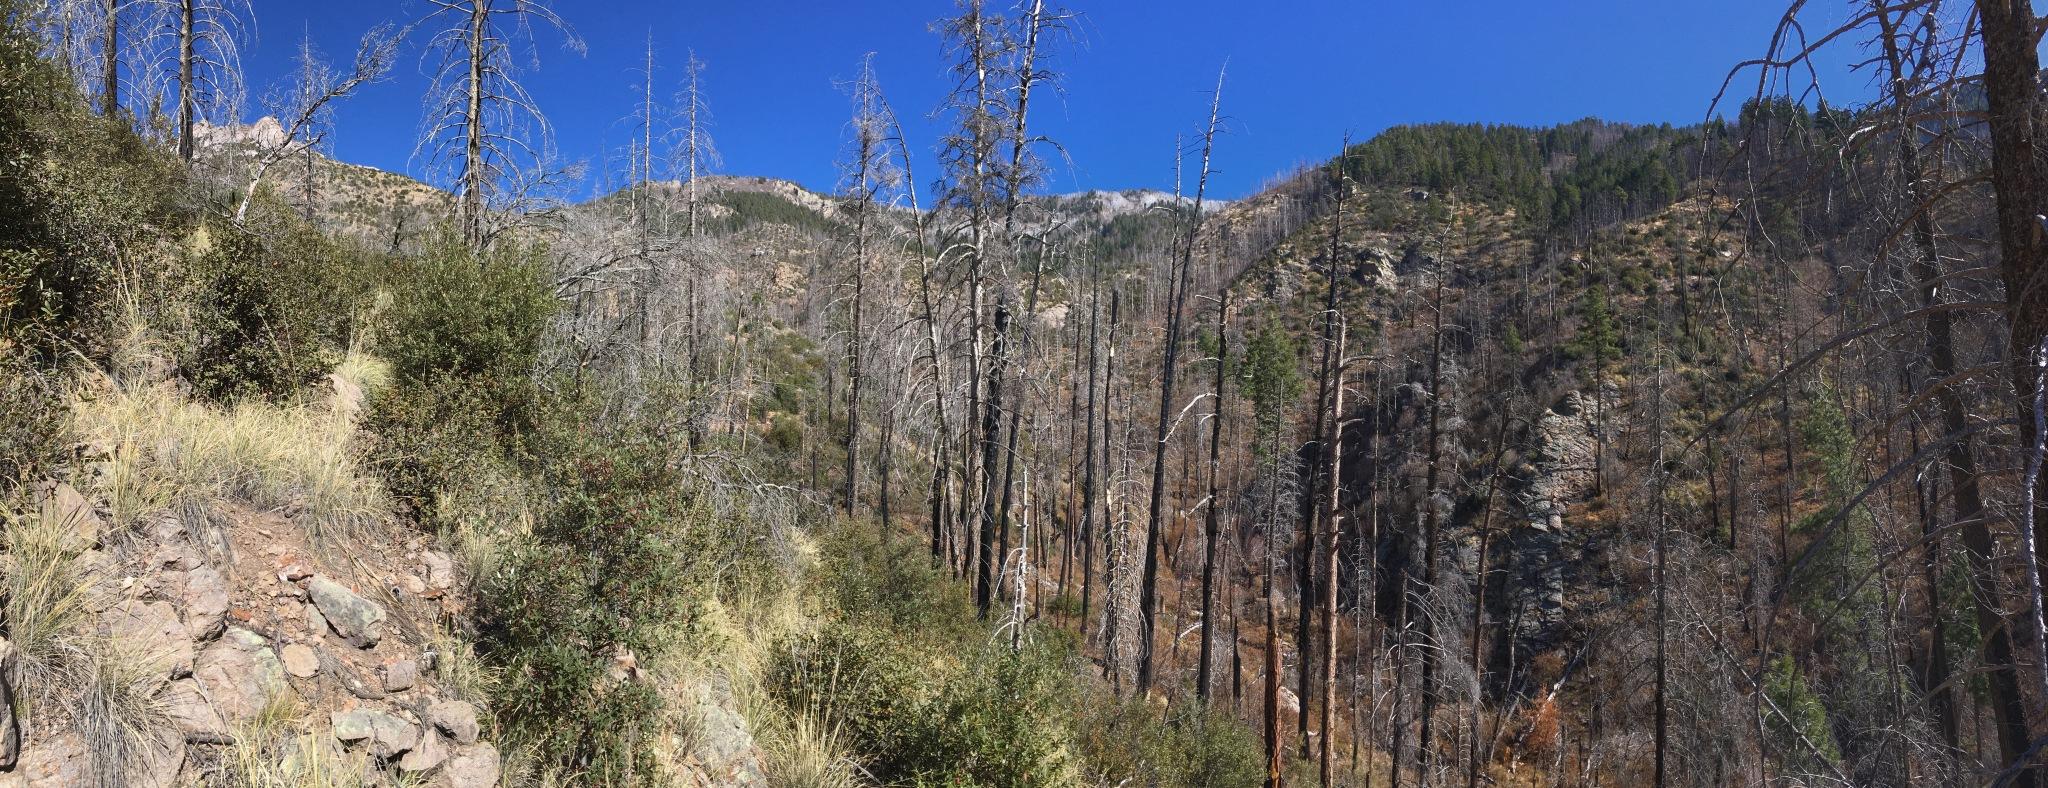 08 Mogollon Ridge from turnback point